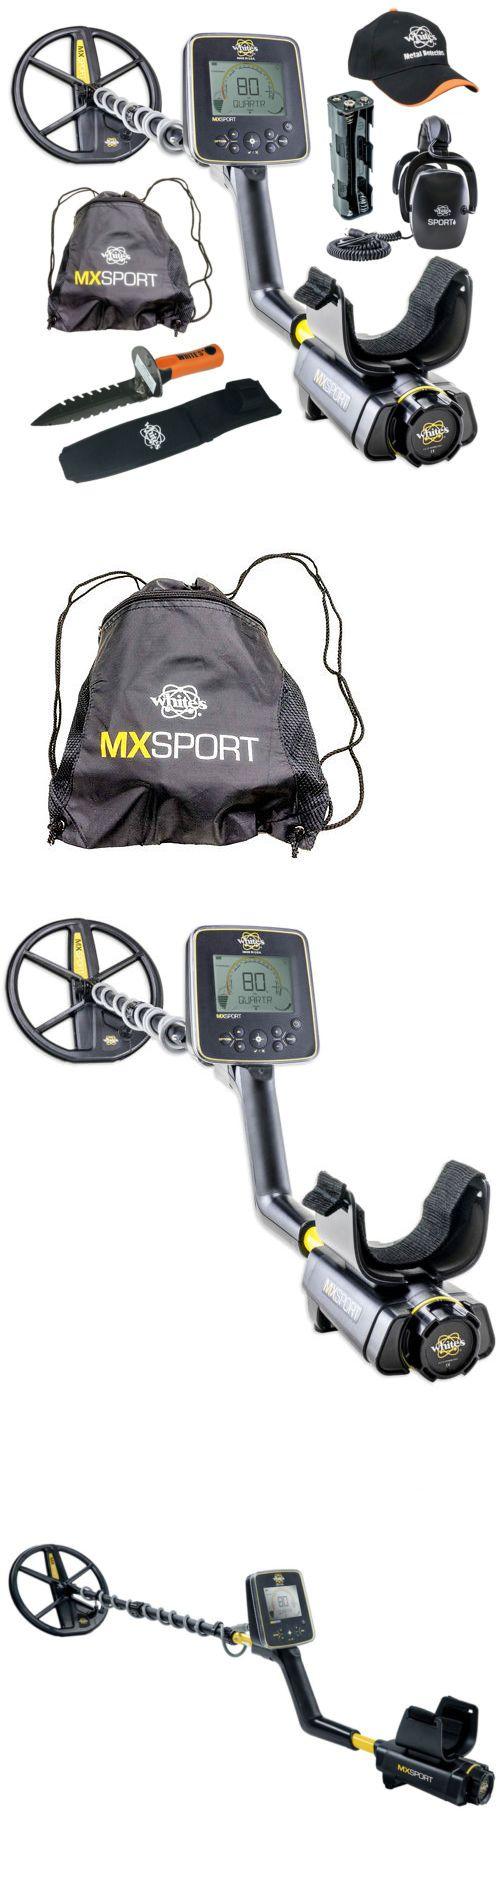 Metal Detectors: Whites Mx Sport Waterproof Metal Detector Geared Up Bundle BUY IT NOW ONLY: $799.95